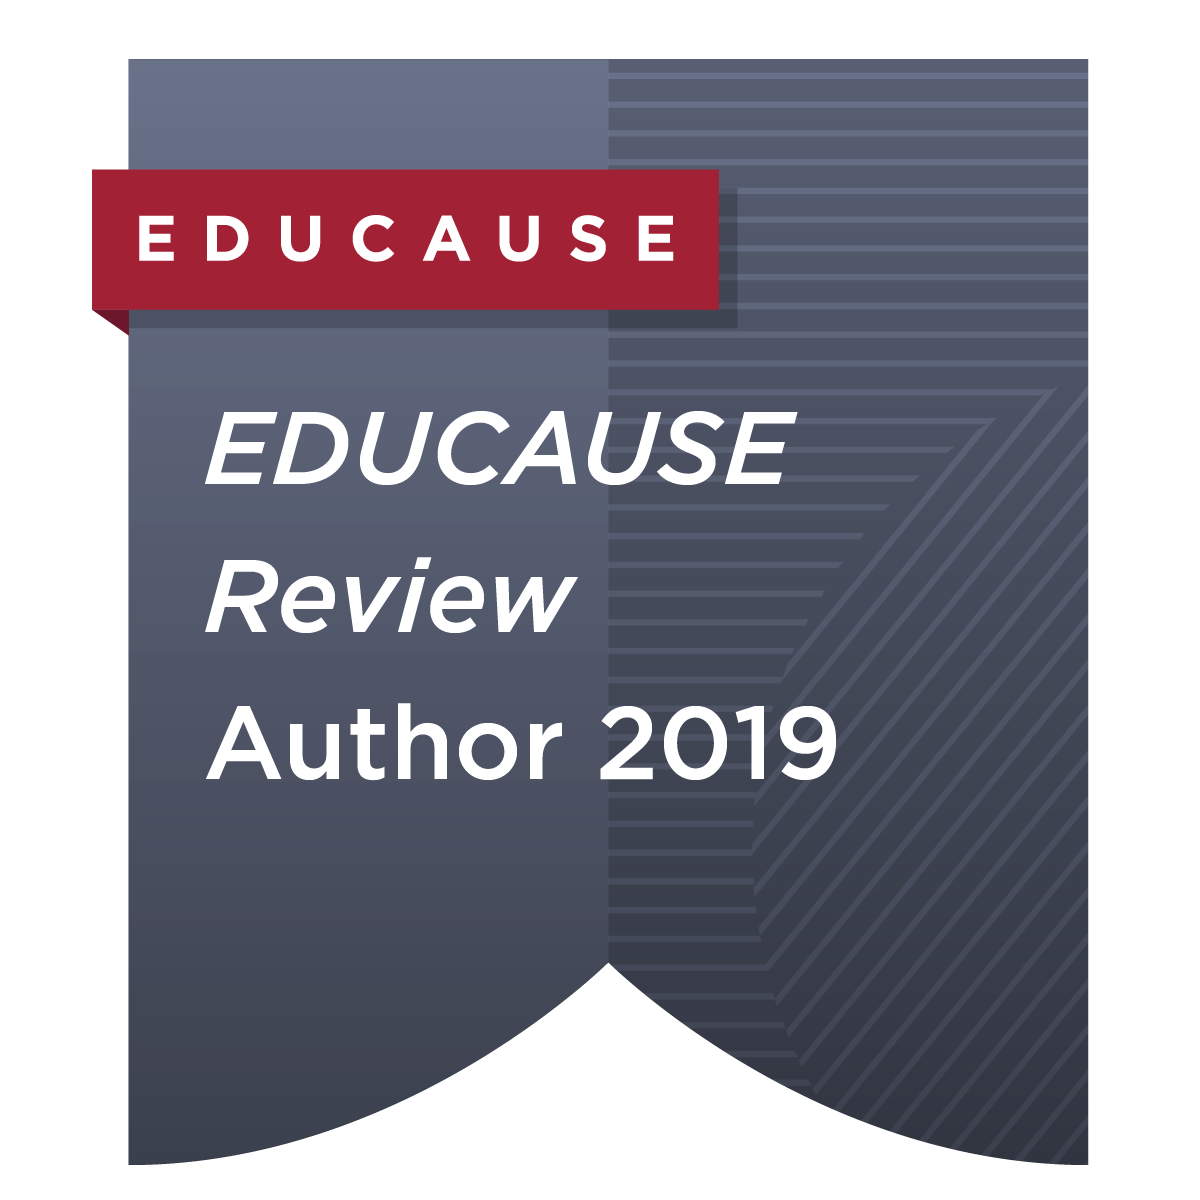 EDUCAUSE Review Author 2019